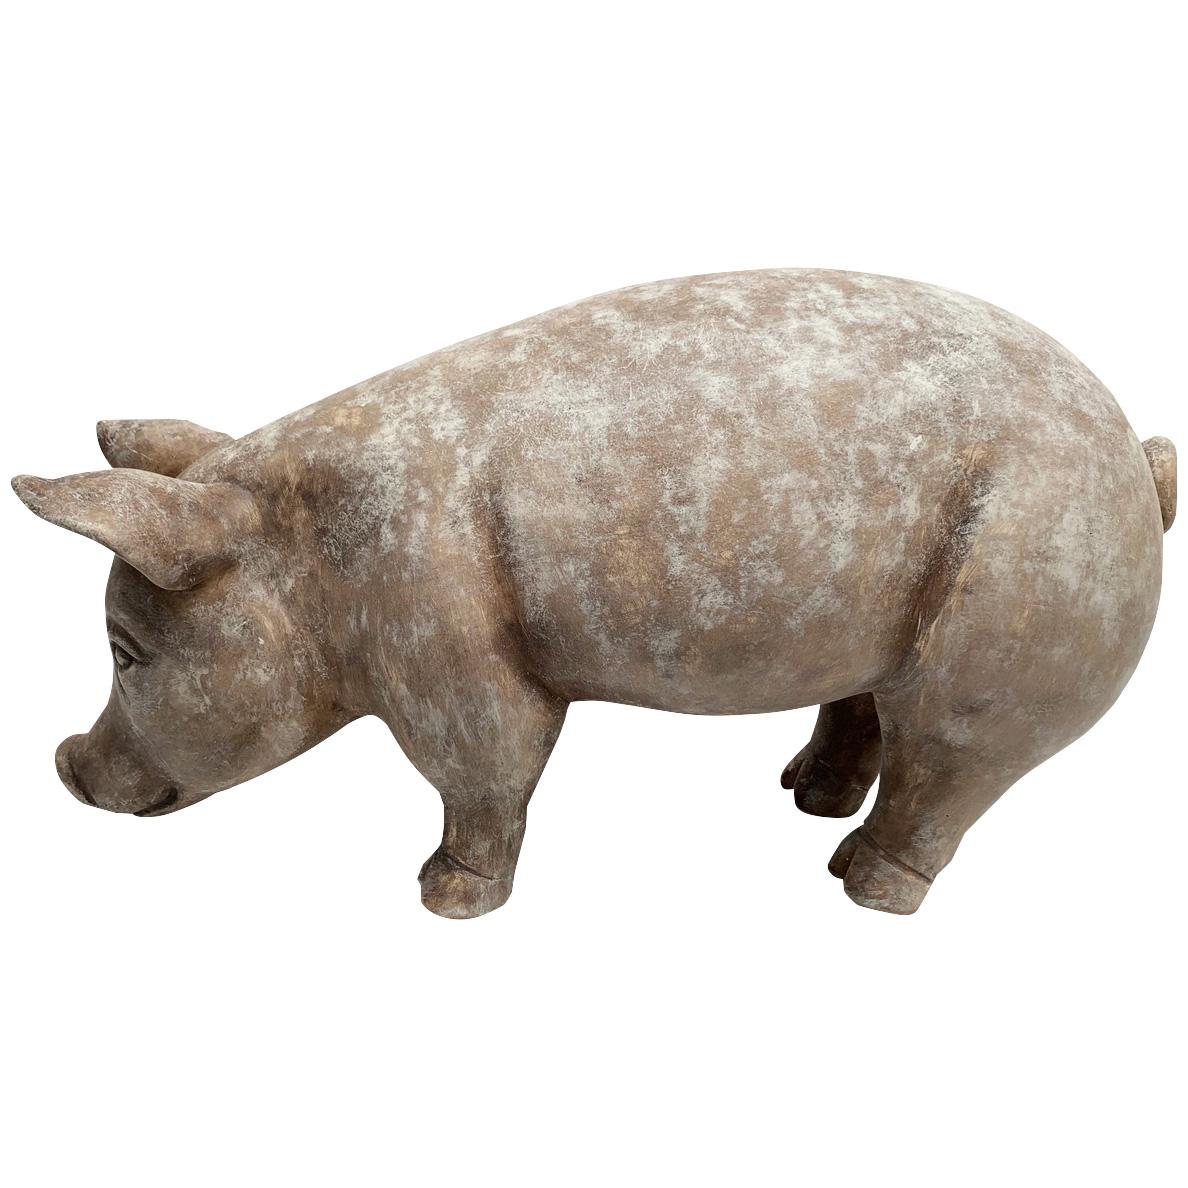 Promart | Terracotta Puerco Rustic Pig Sculpture